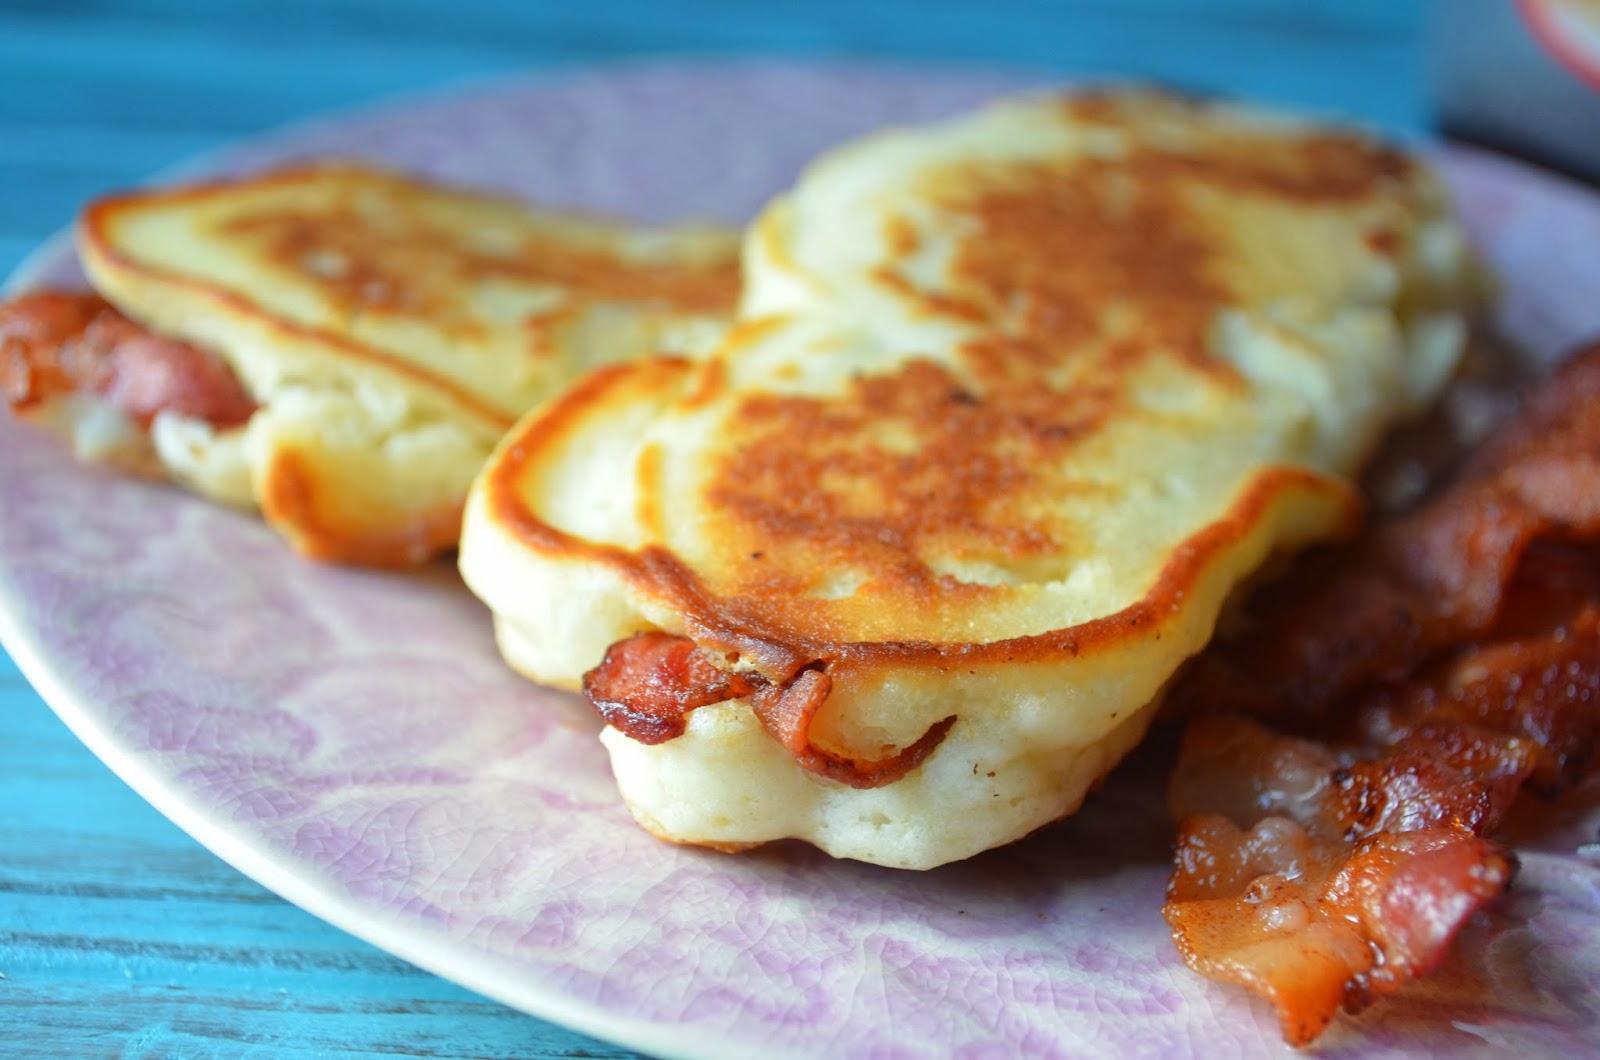 9 Photos of Bacon Wrapped Pancakes